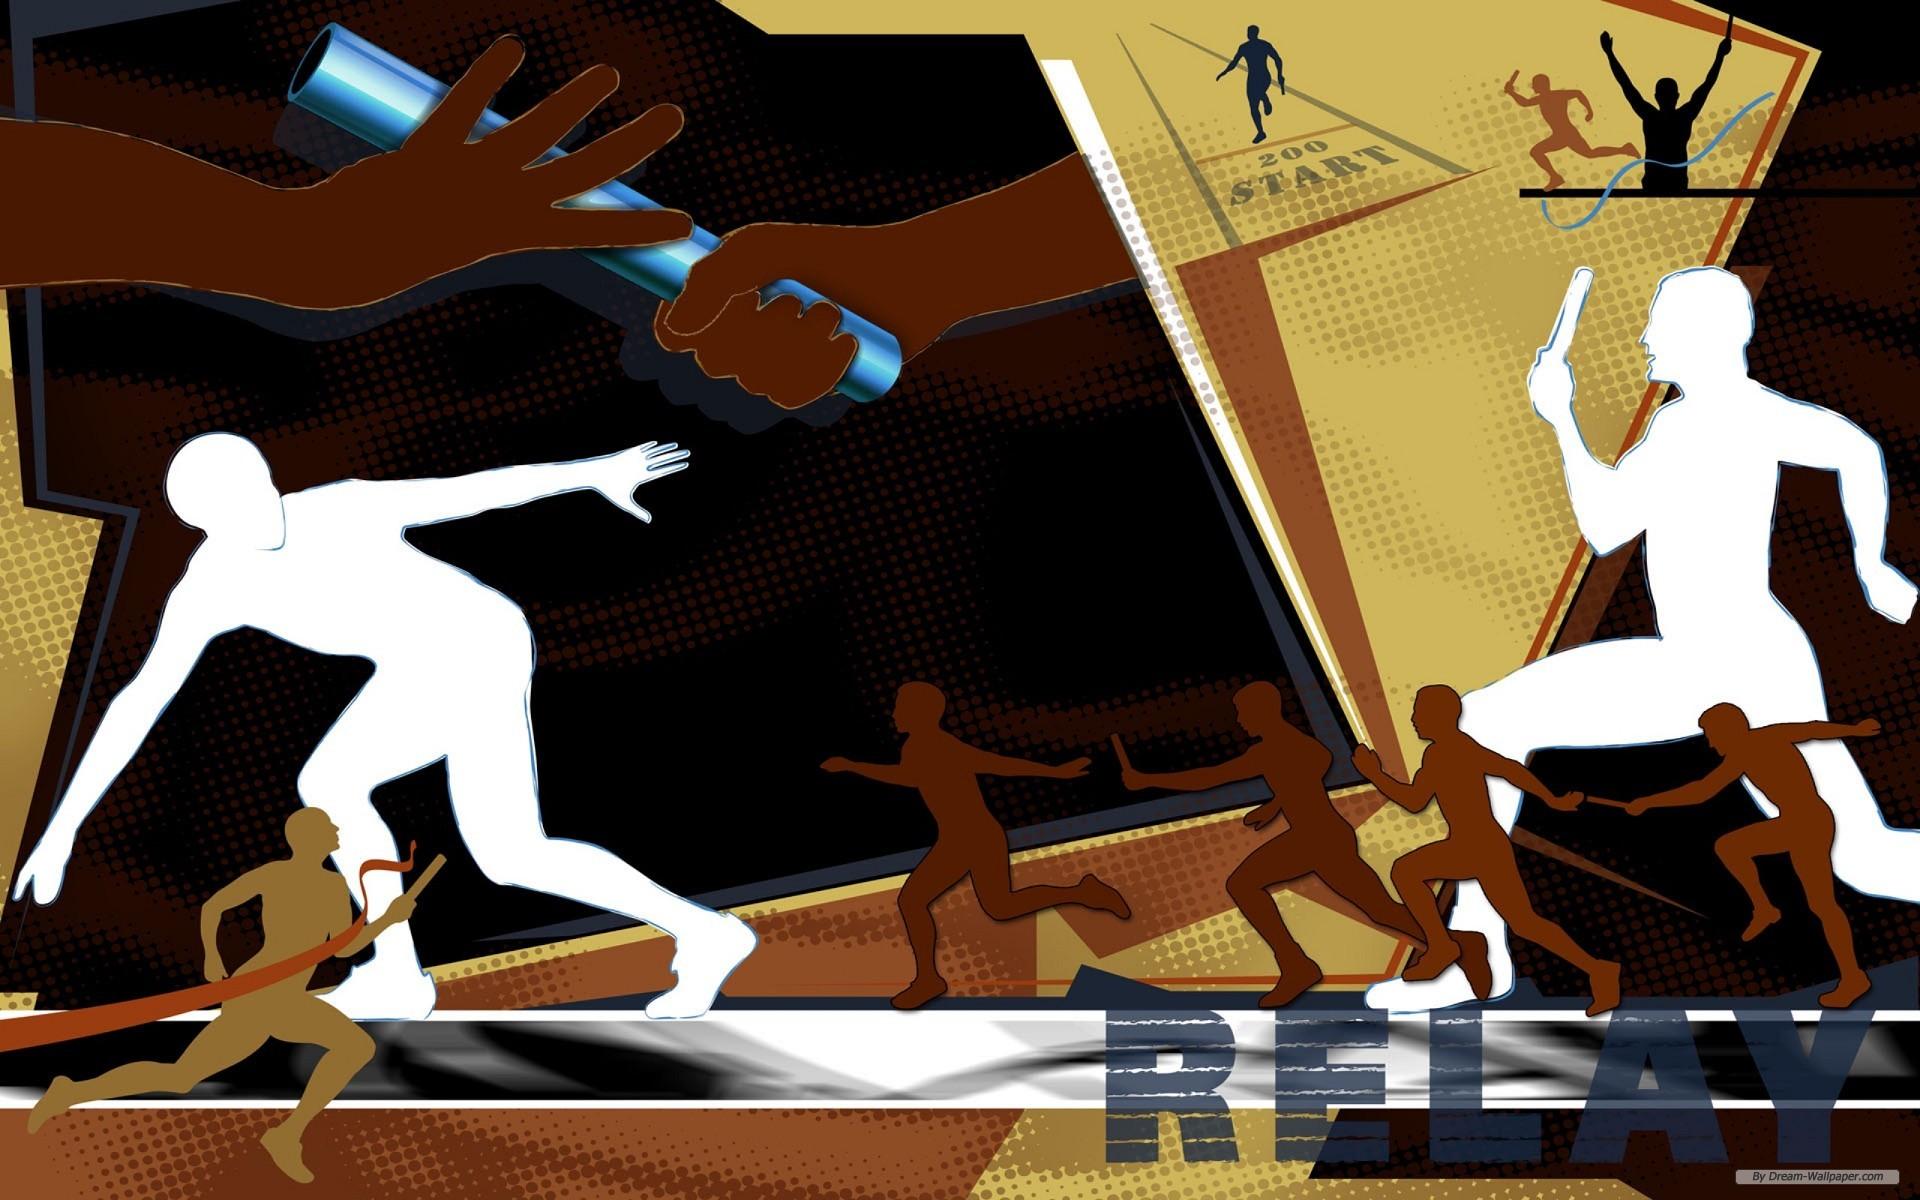 75] Sports Desktop Wallpaper on WallpaperSafari 1920x1200